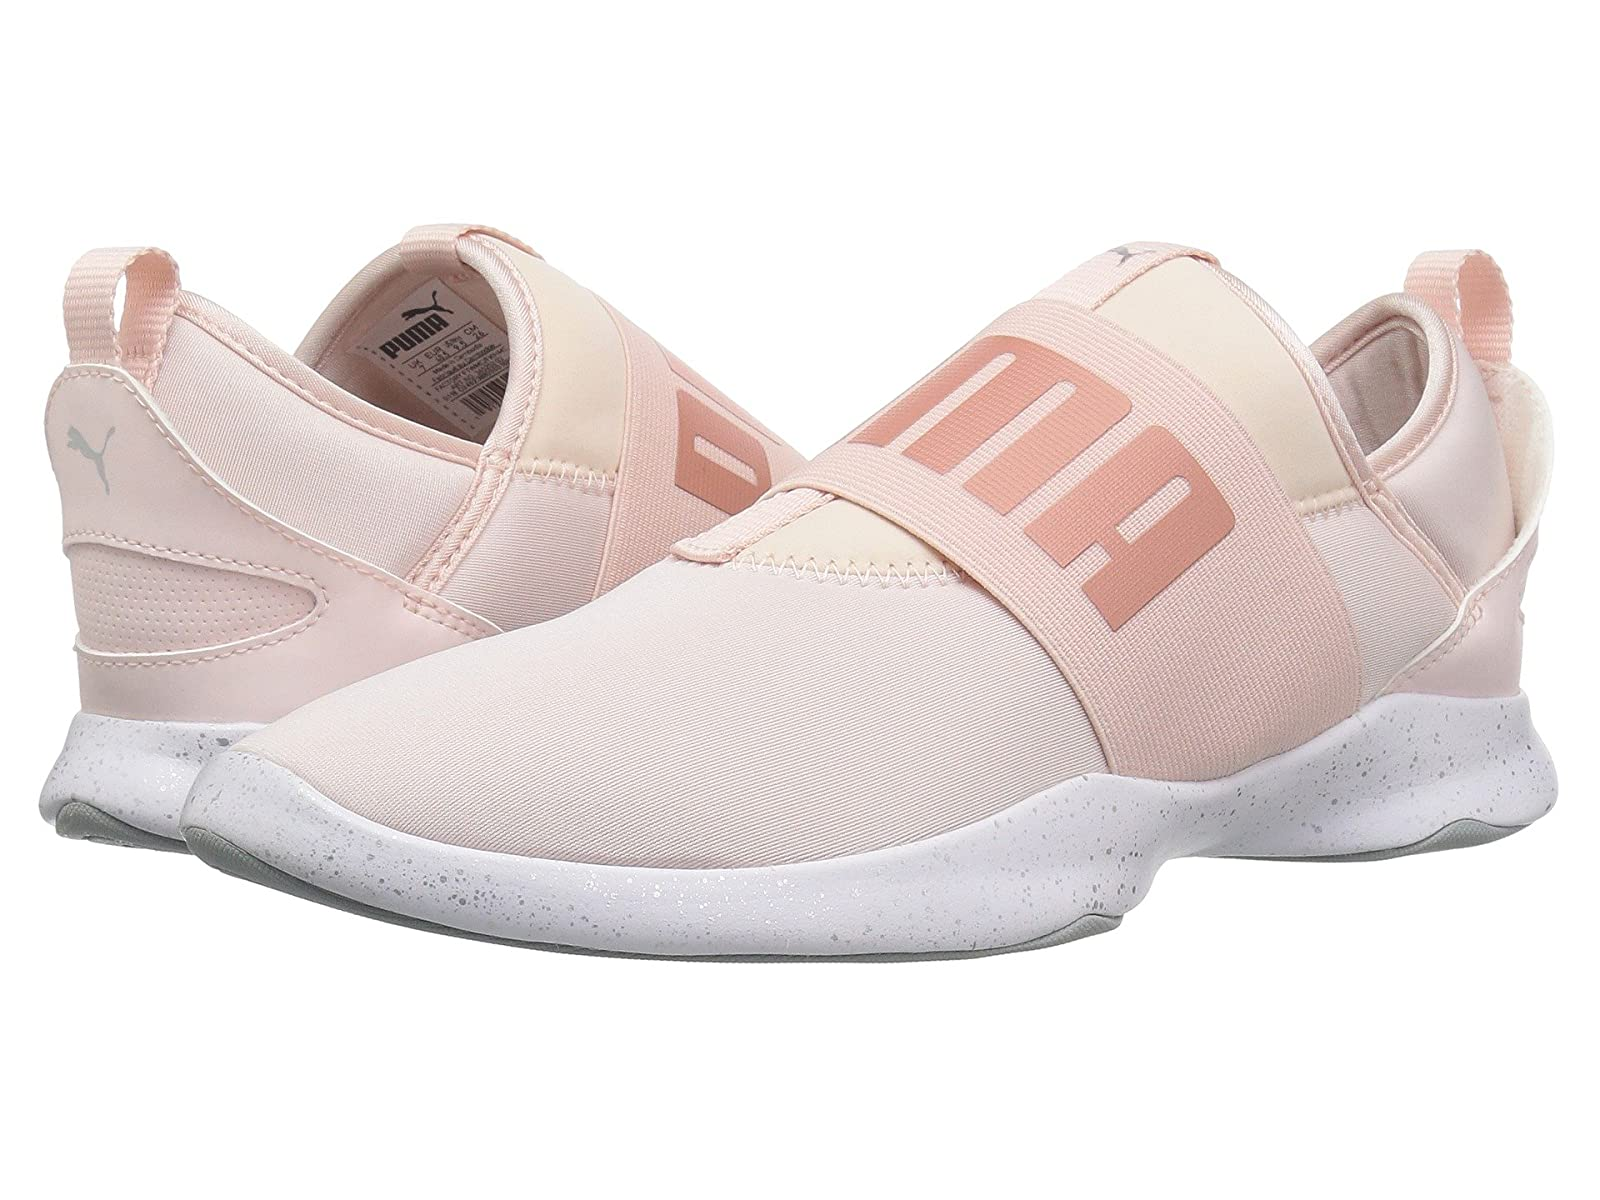 PUMA Dare SpecklesCheap and distinctive eye-catching shoes